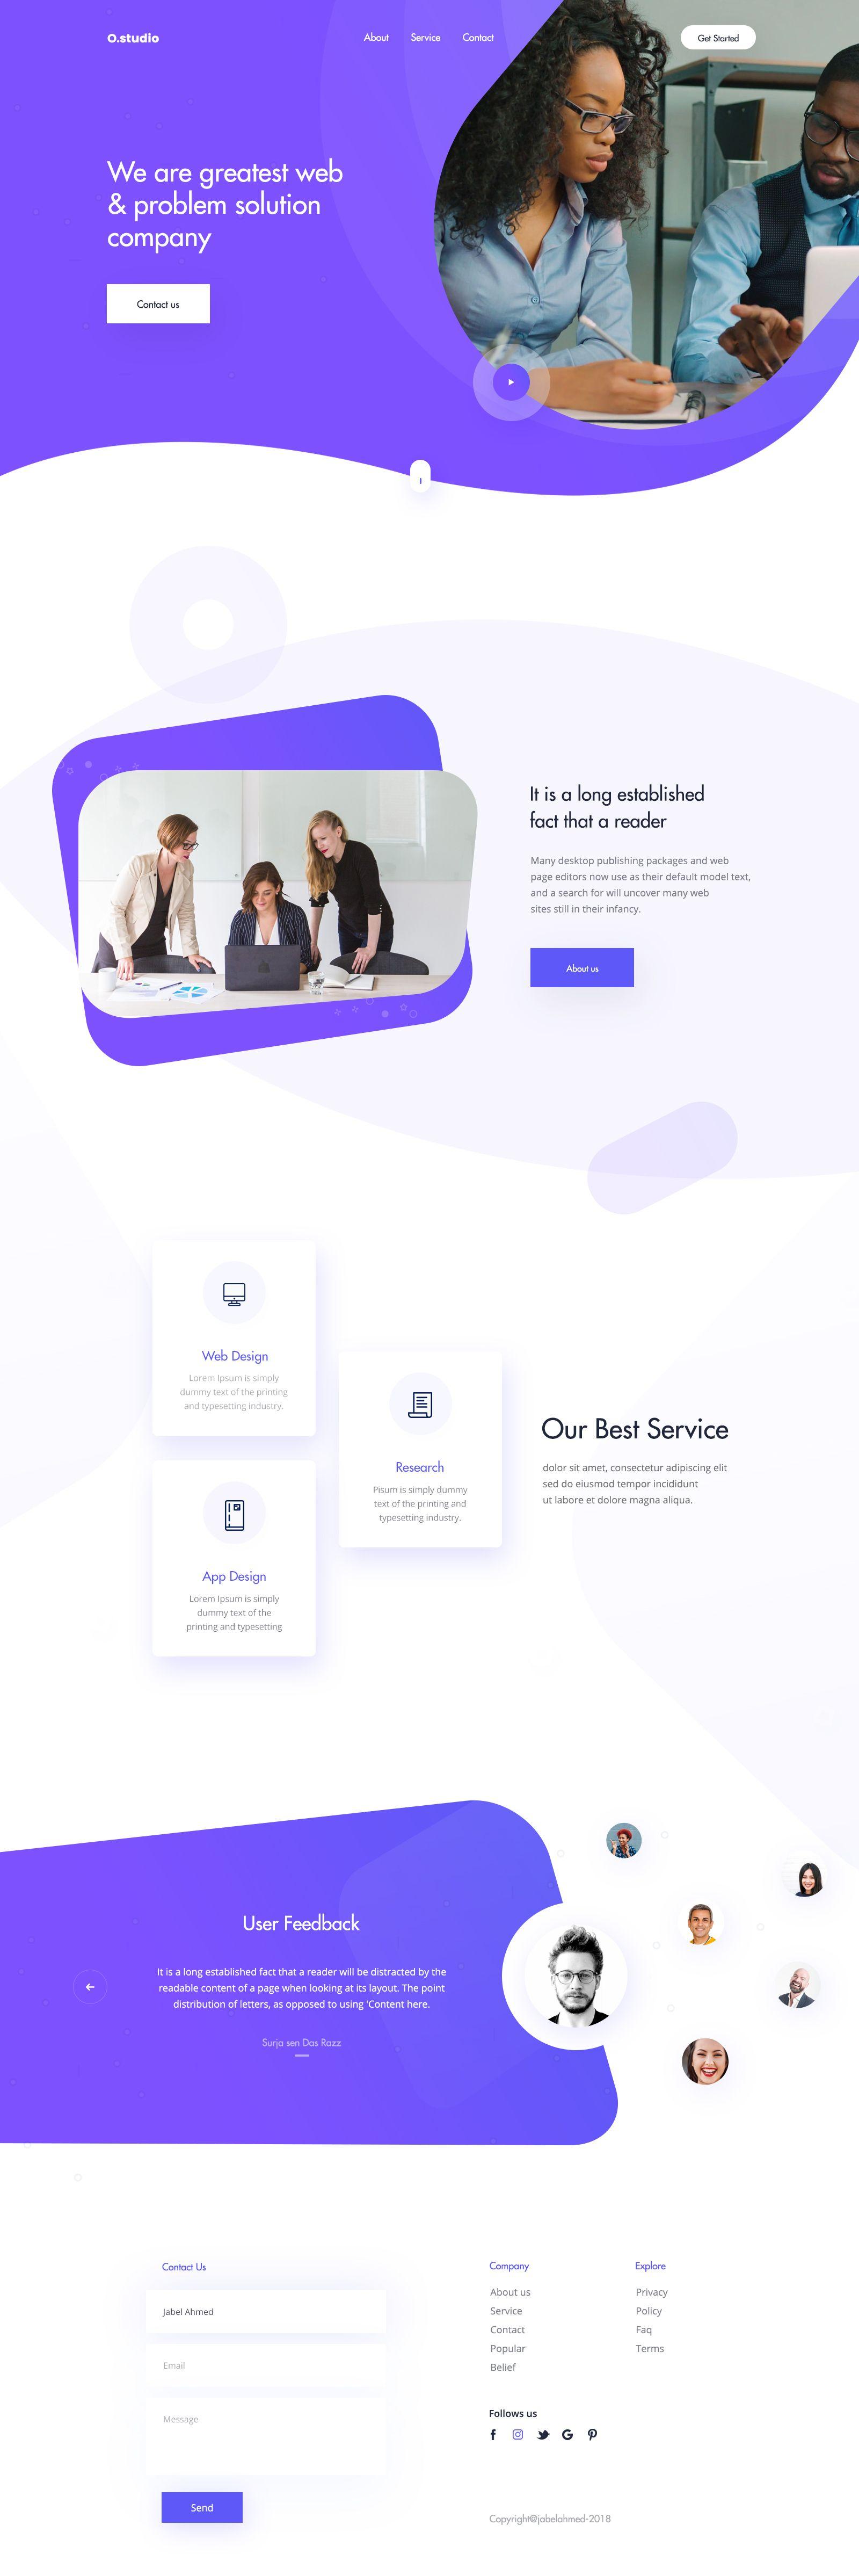 Landing Page Psd 02 Web Design Marketing Website Design Company Web Design Tips